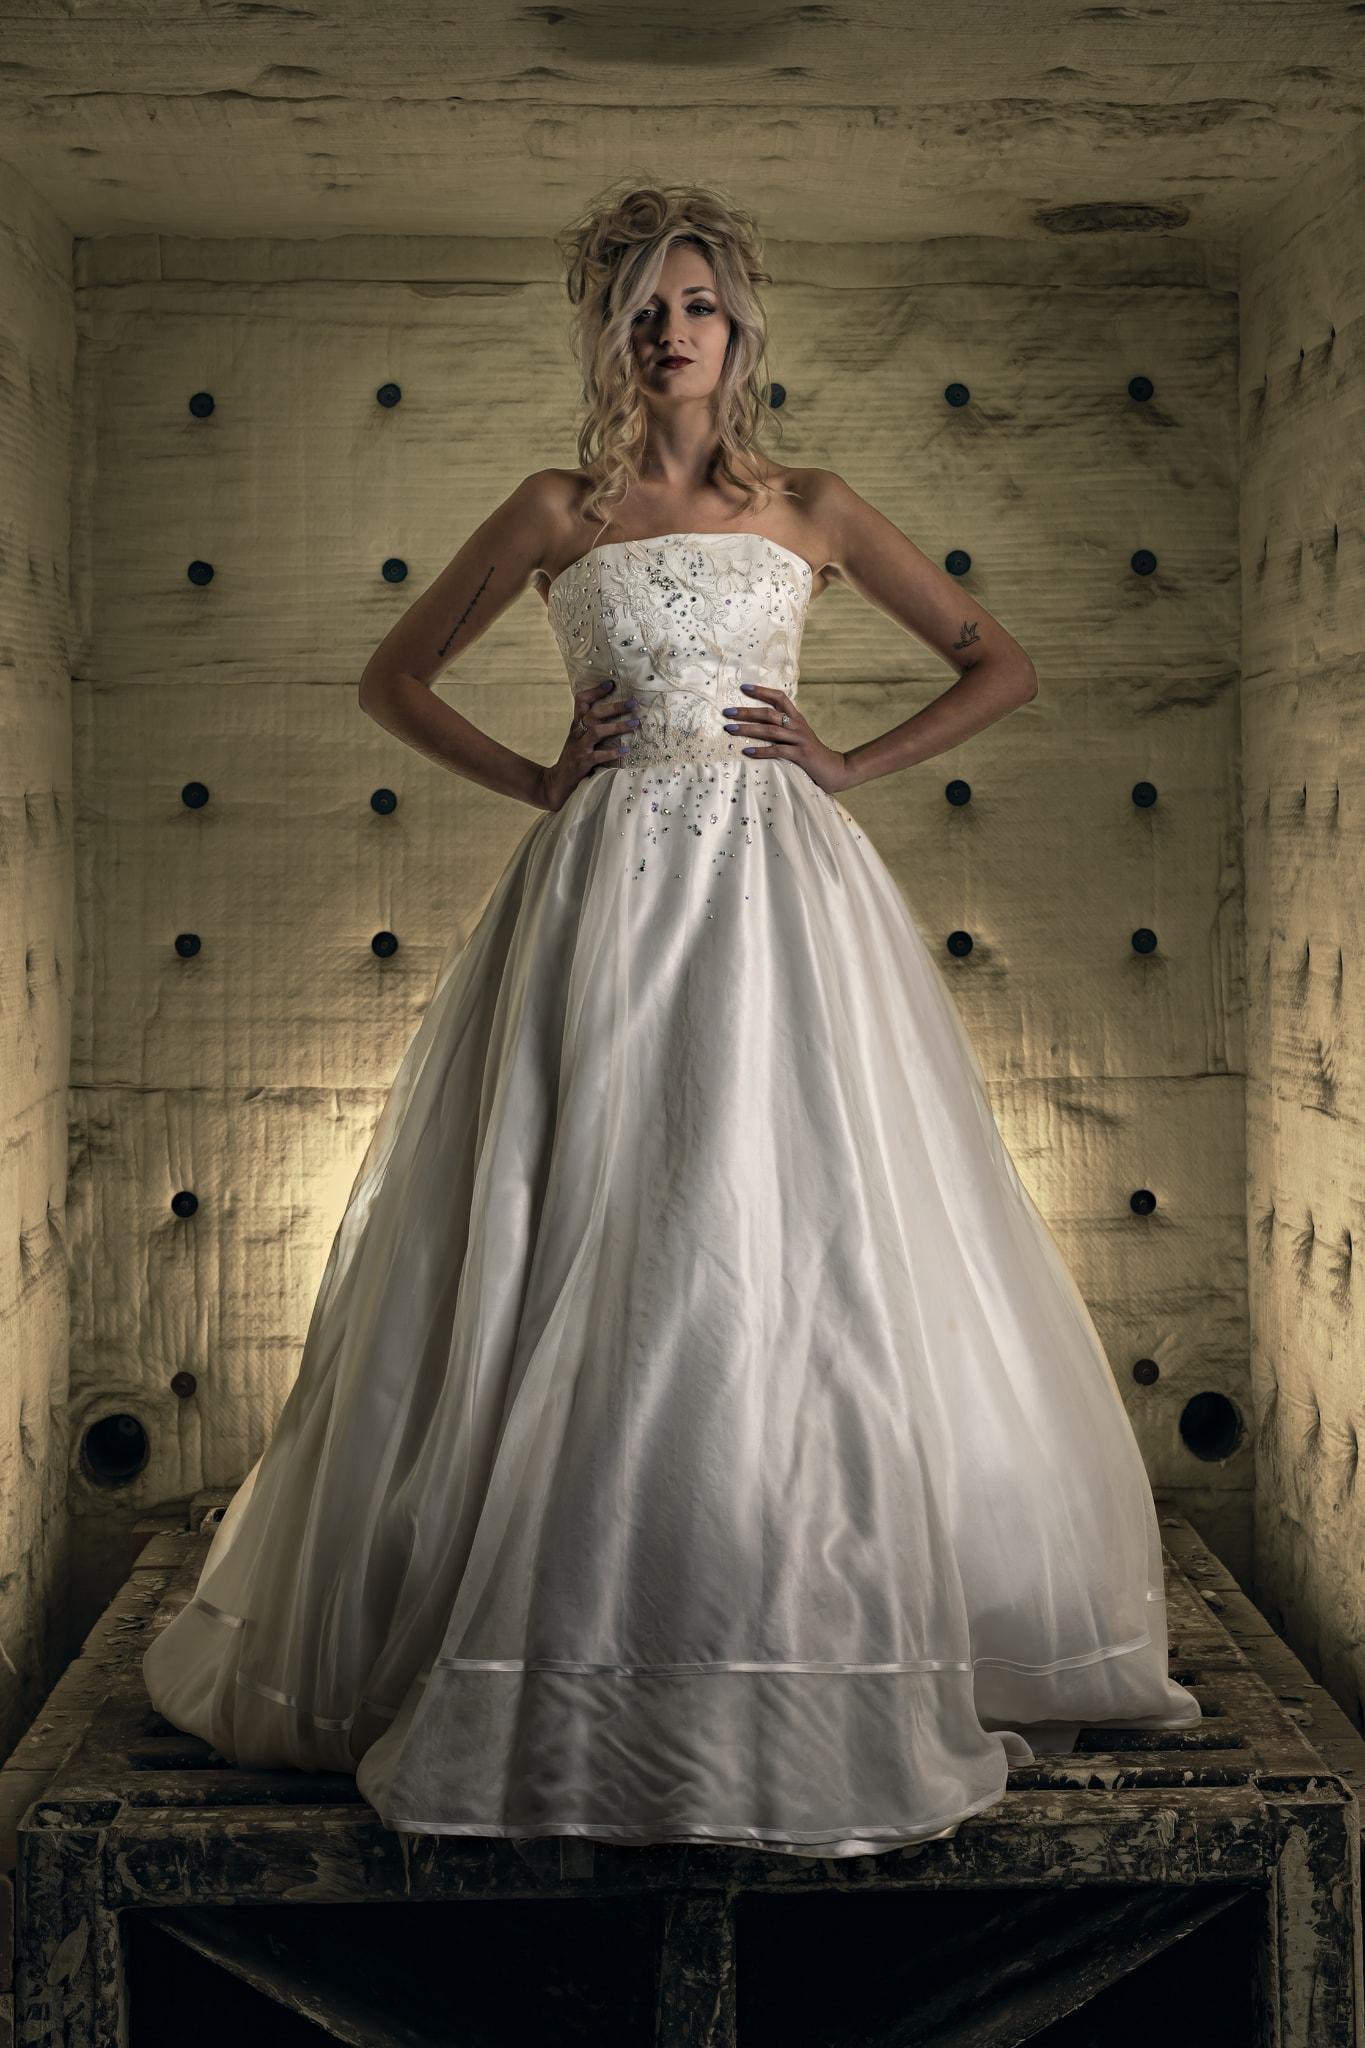 Martin Dobson Luxury bridal wear designer Silk organza dress with embroidery and Swarovski crystals